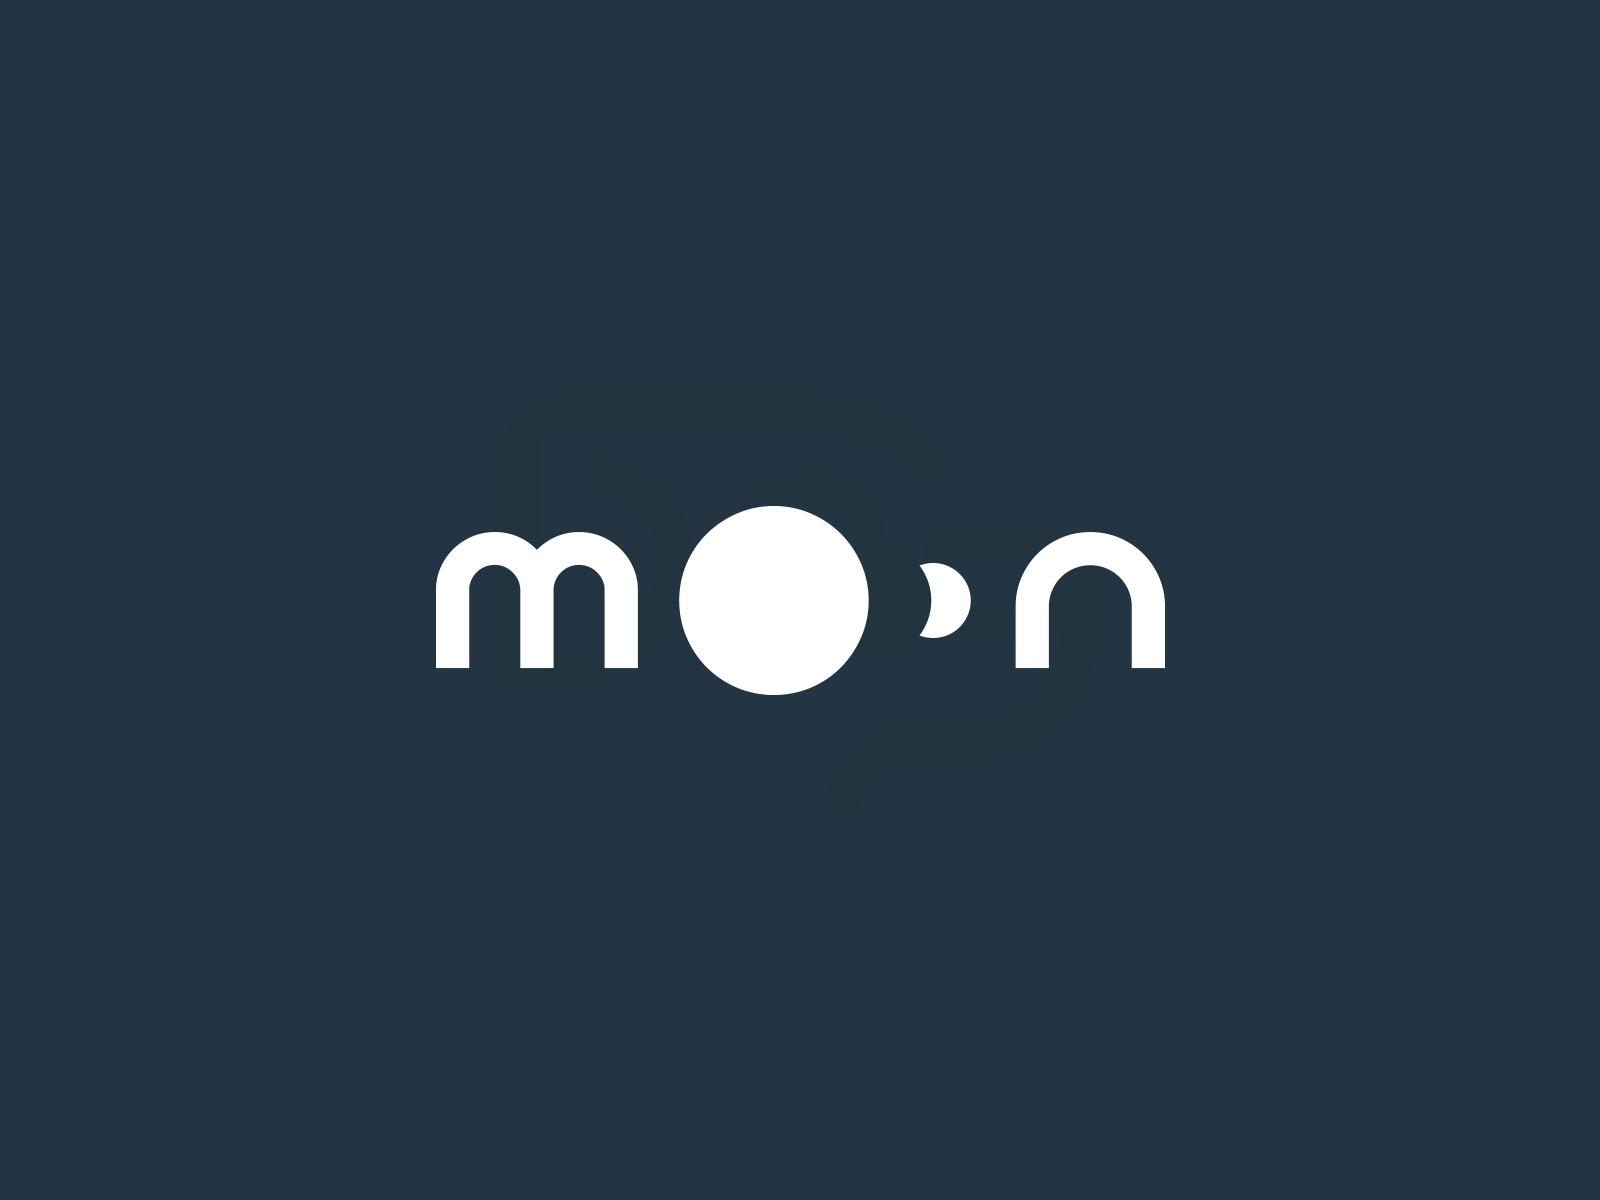 Ramin nasibov logo  moon branding logofolio  4x